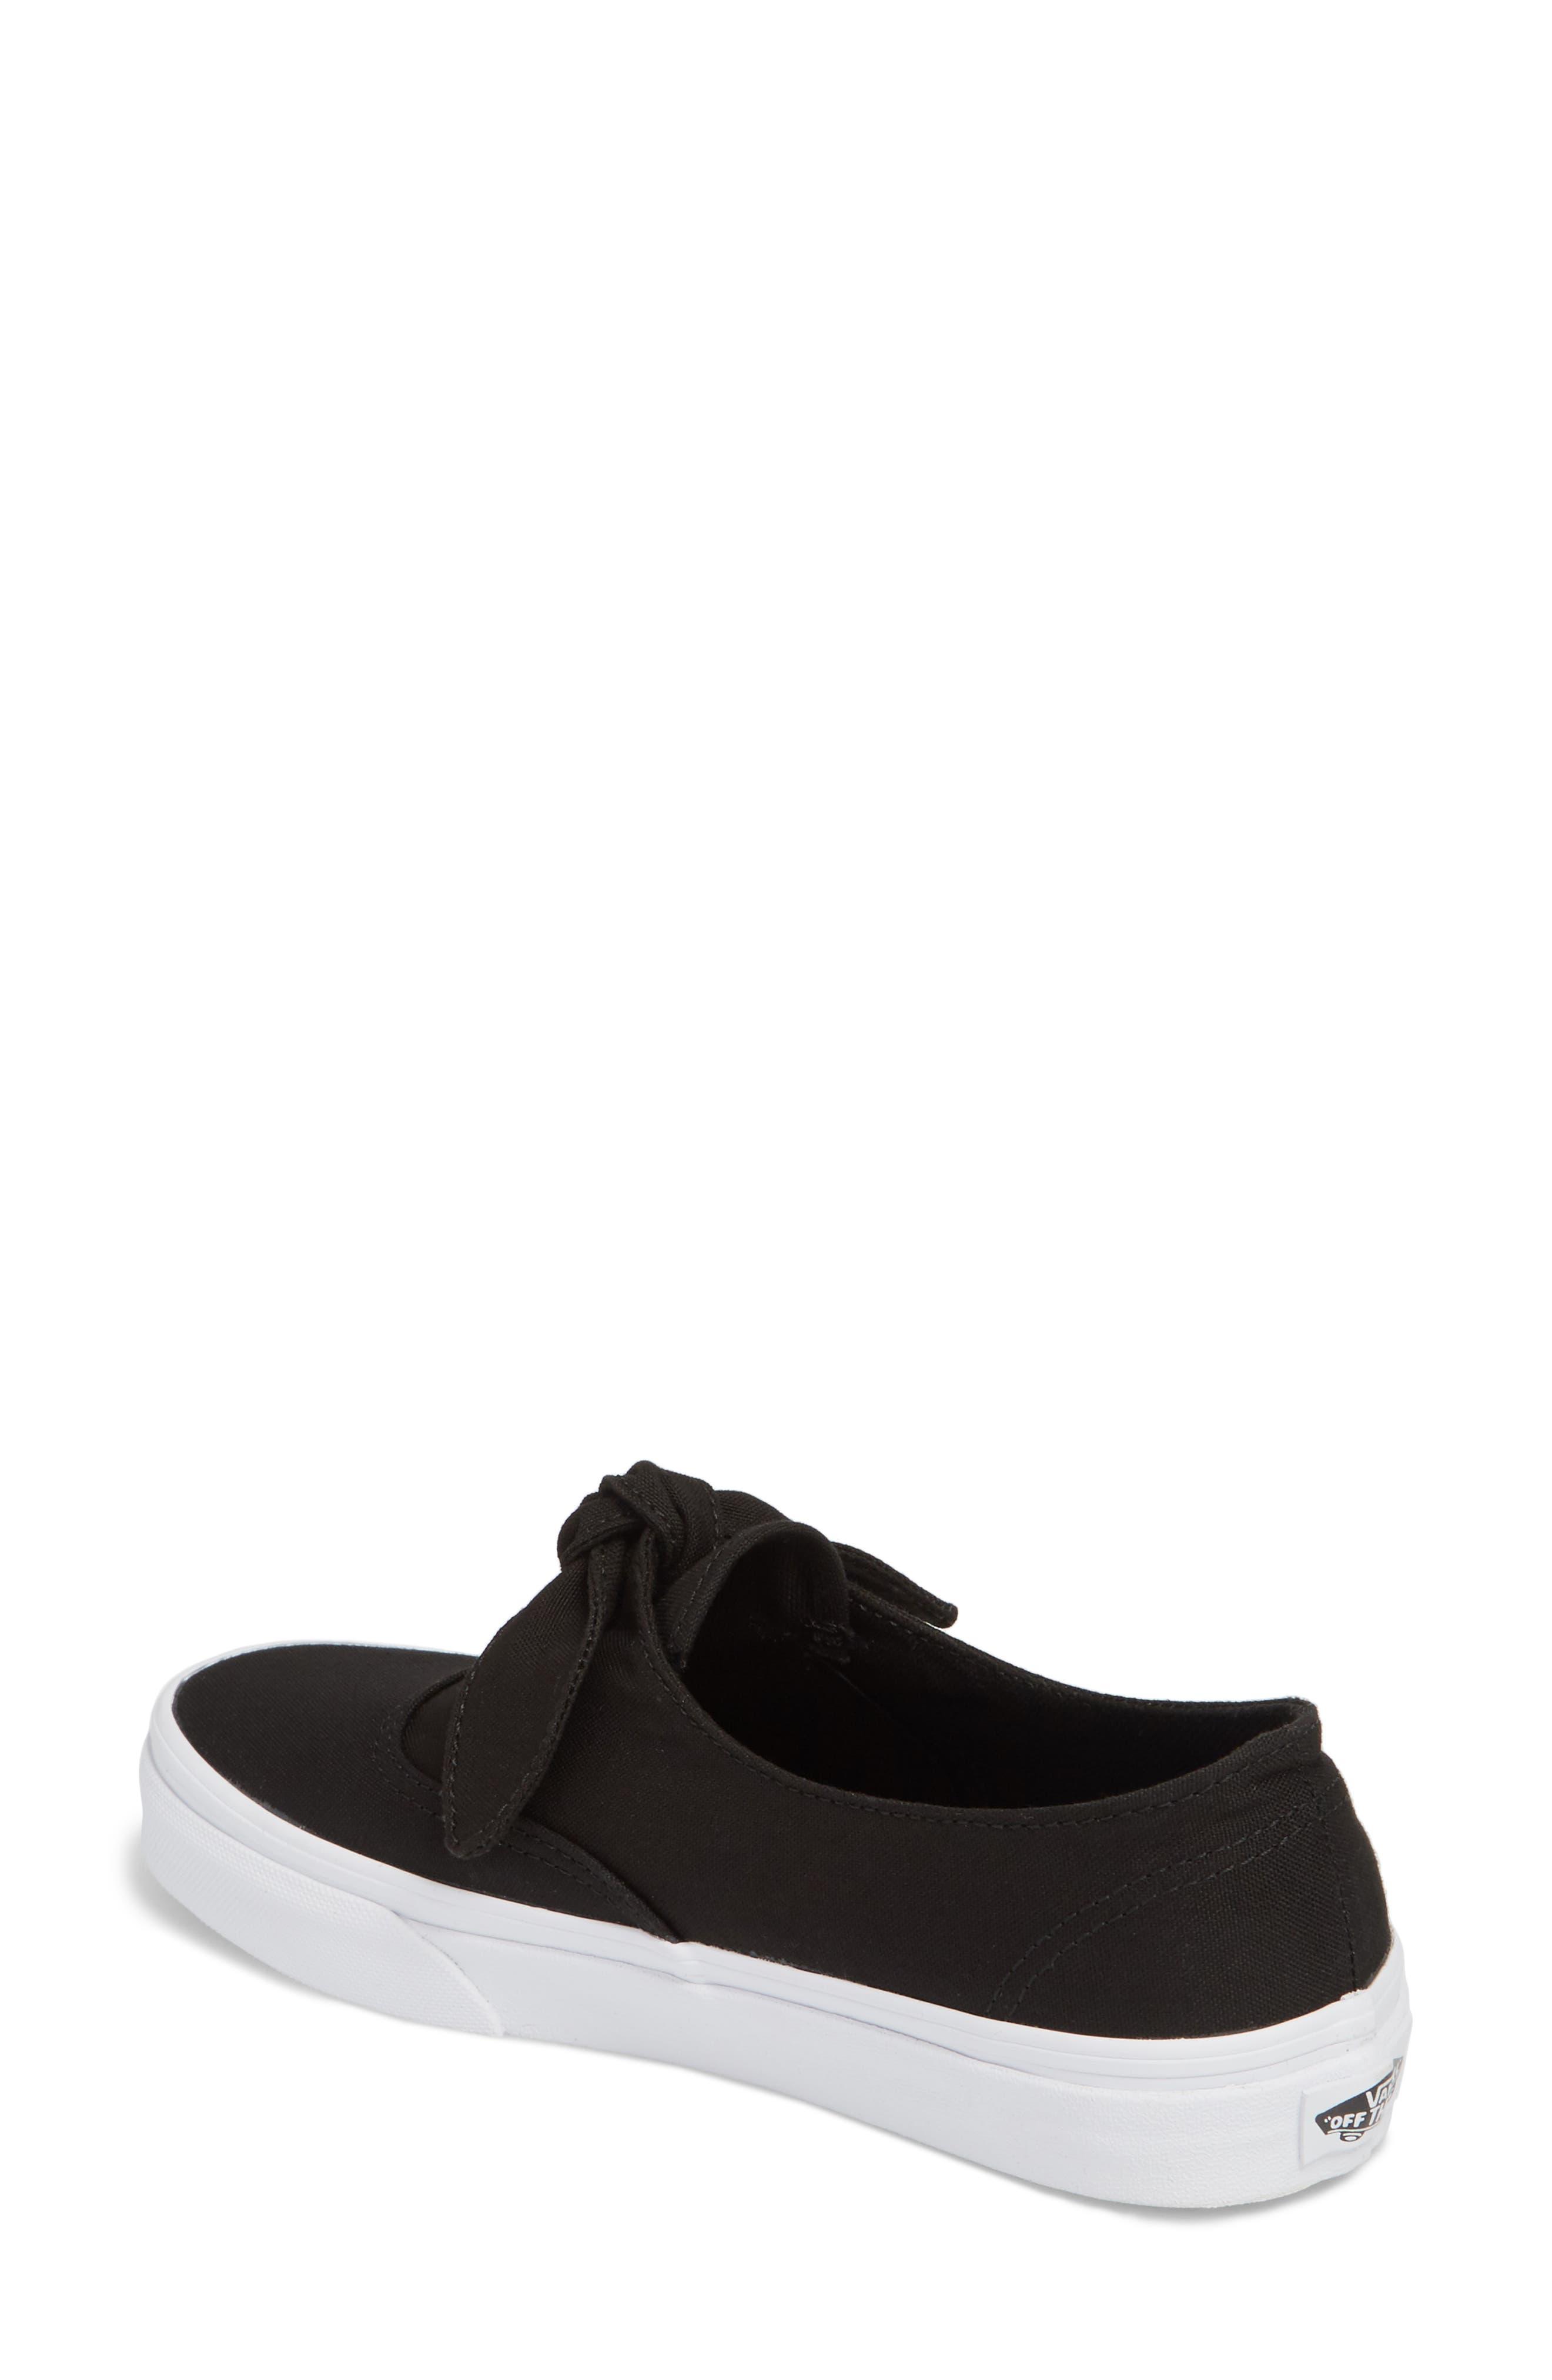 Alternate Image 2  - Vans UA Authentic Knotted Slip-On Sneaker (Women)